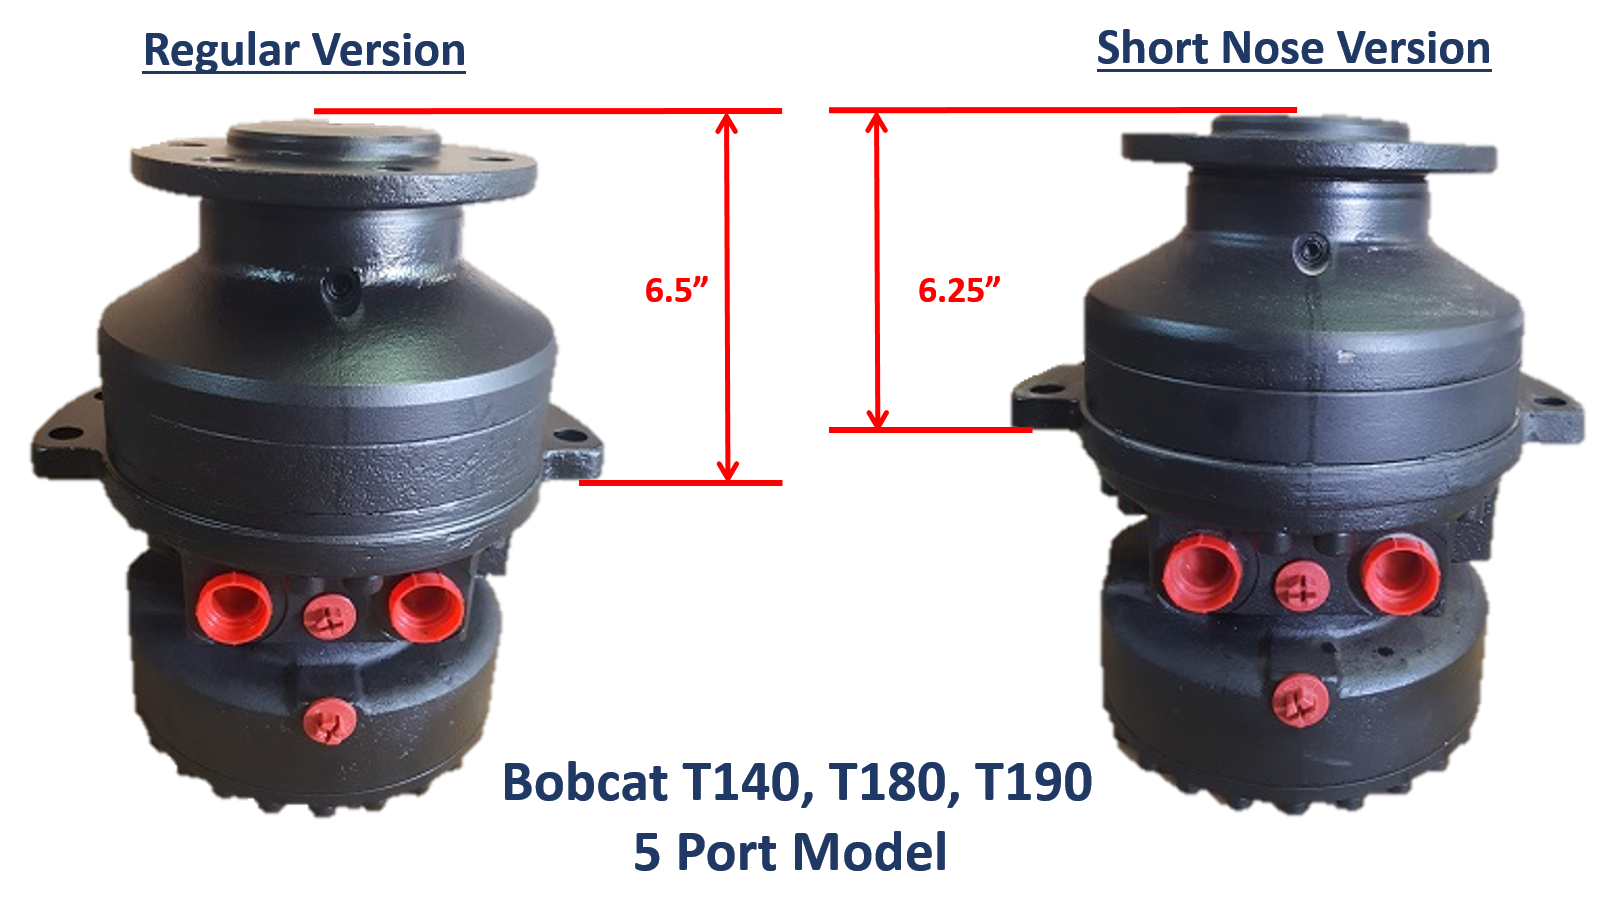 bobcat-t140-t180-t190-5-port-model-regular-short-nose